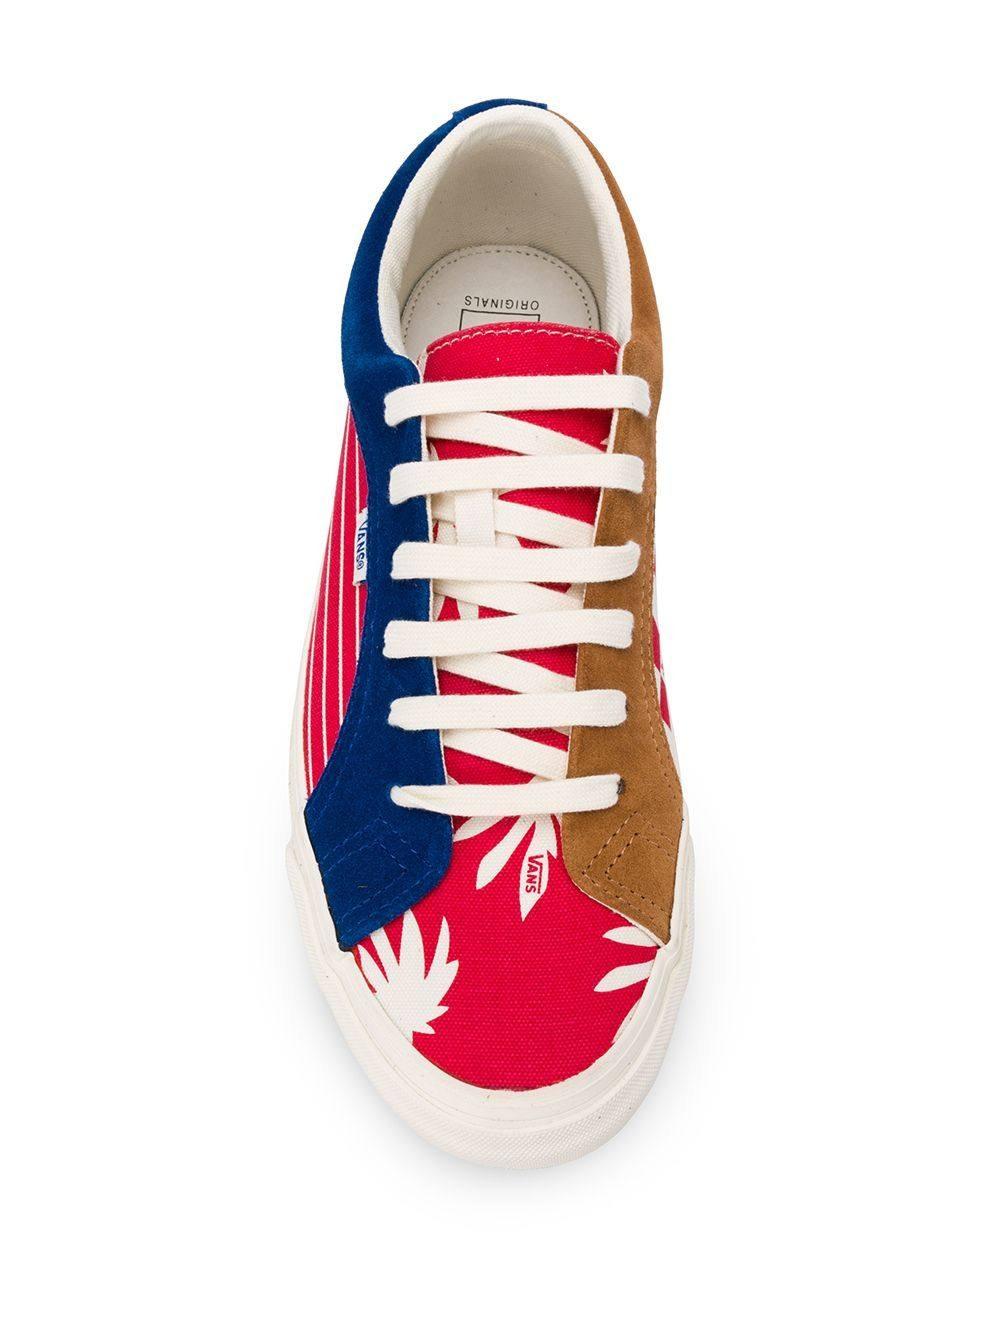 Vans Vans X Lampin Ua Og Sneakers | The Webster